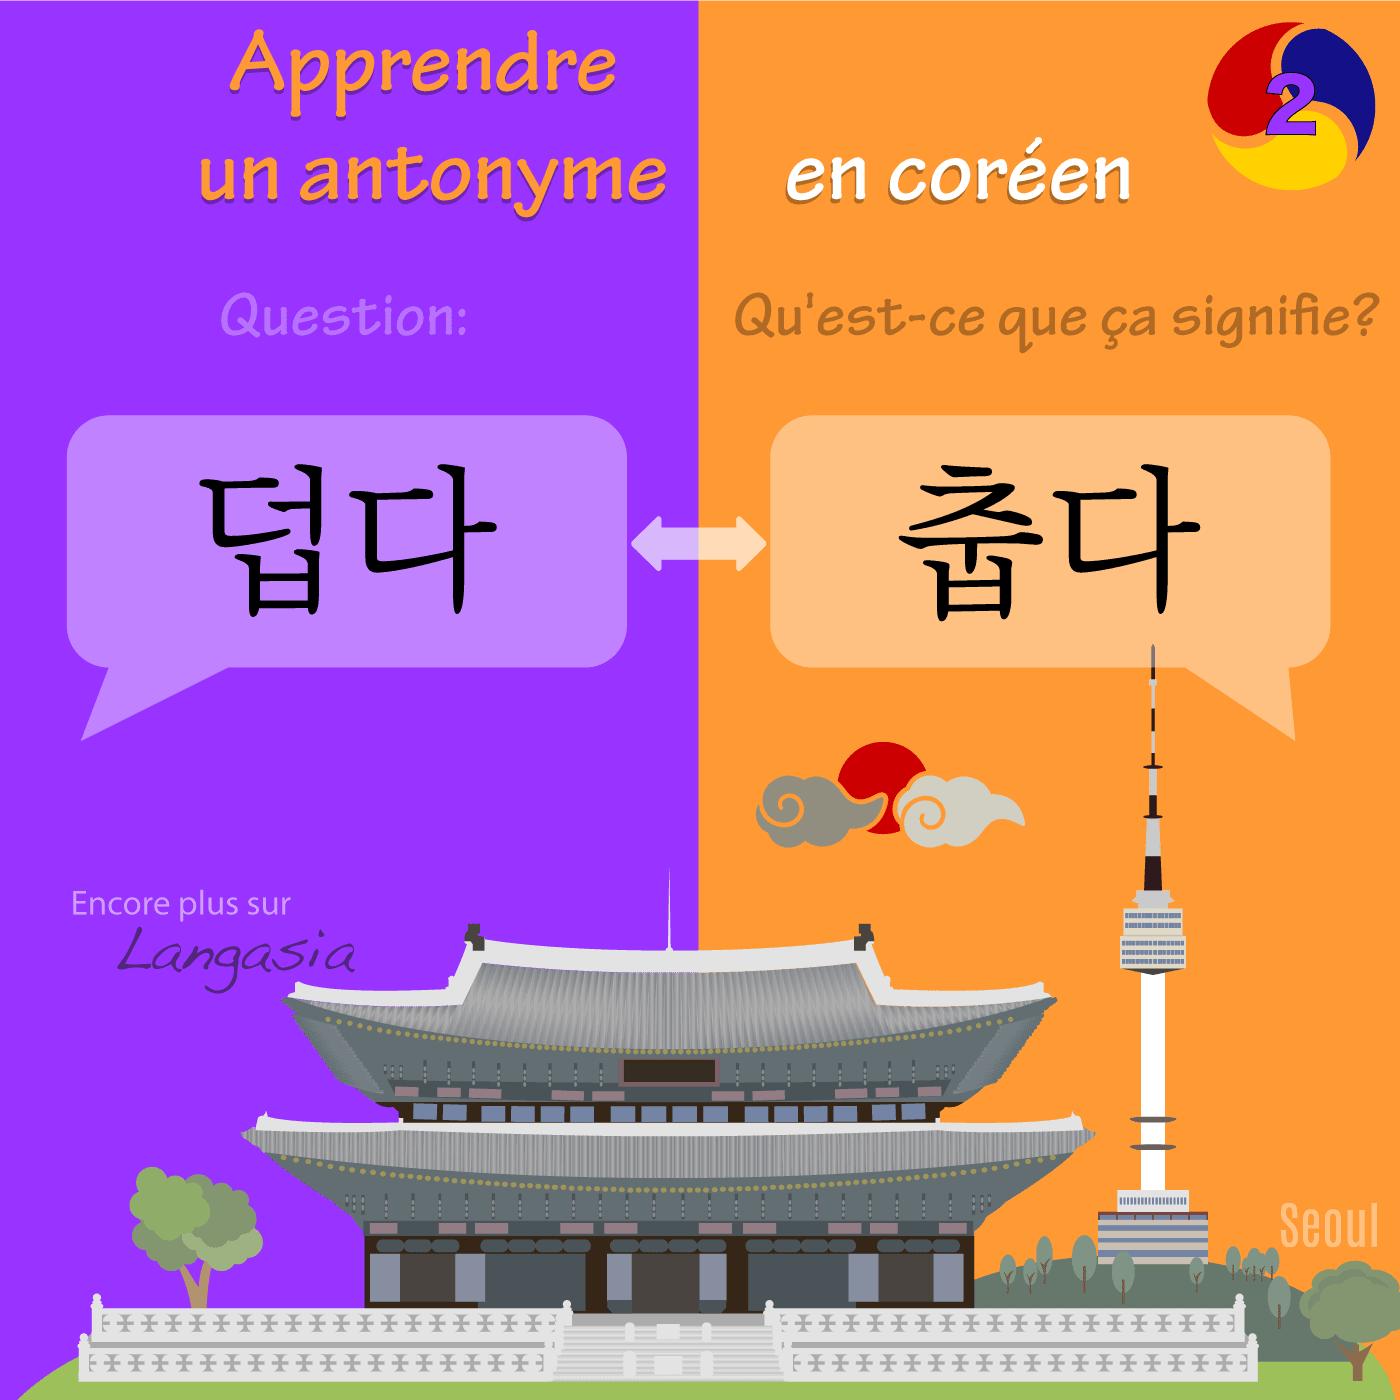 Antonyme en coréen - 덥다 être chaud VS 춥다 être froid